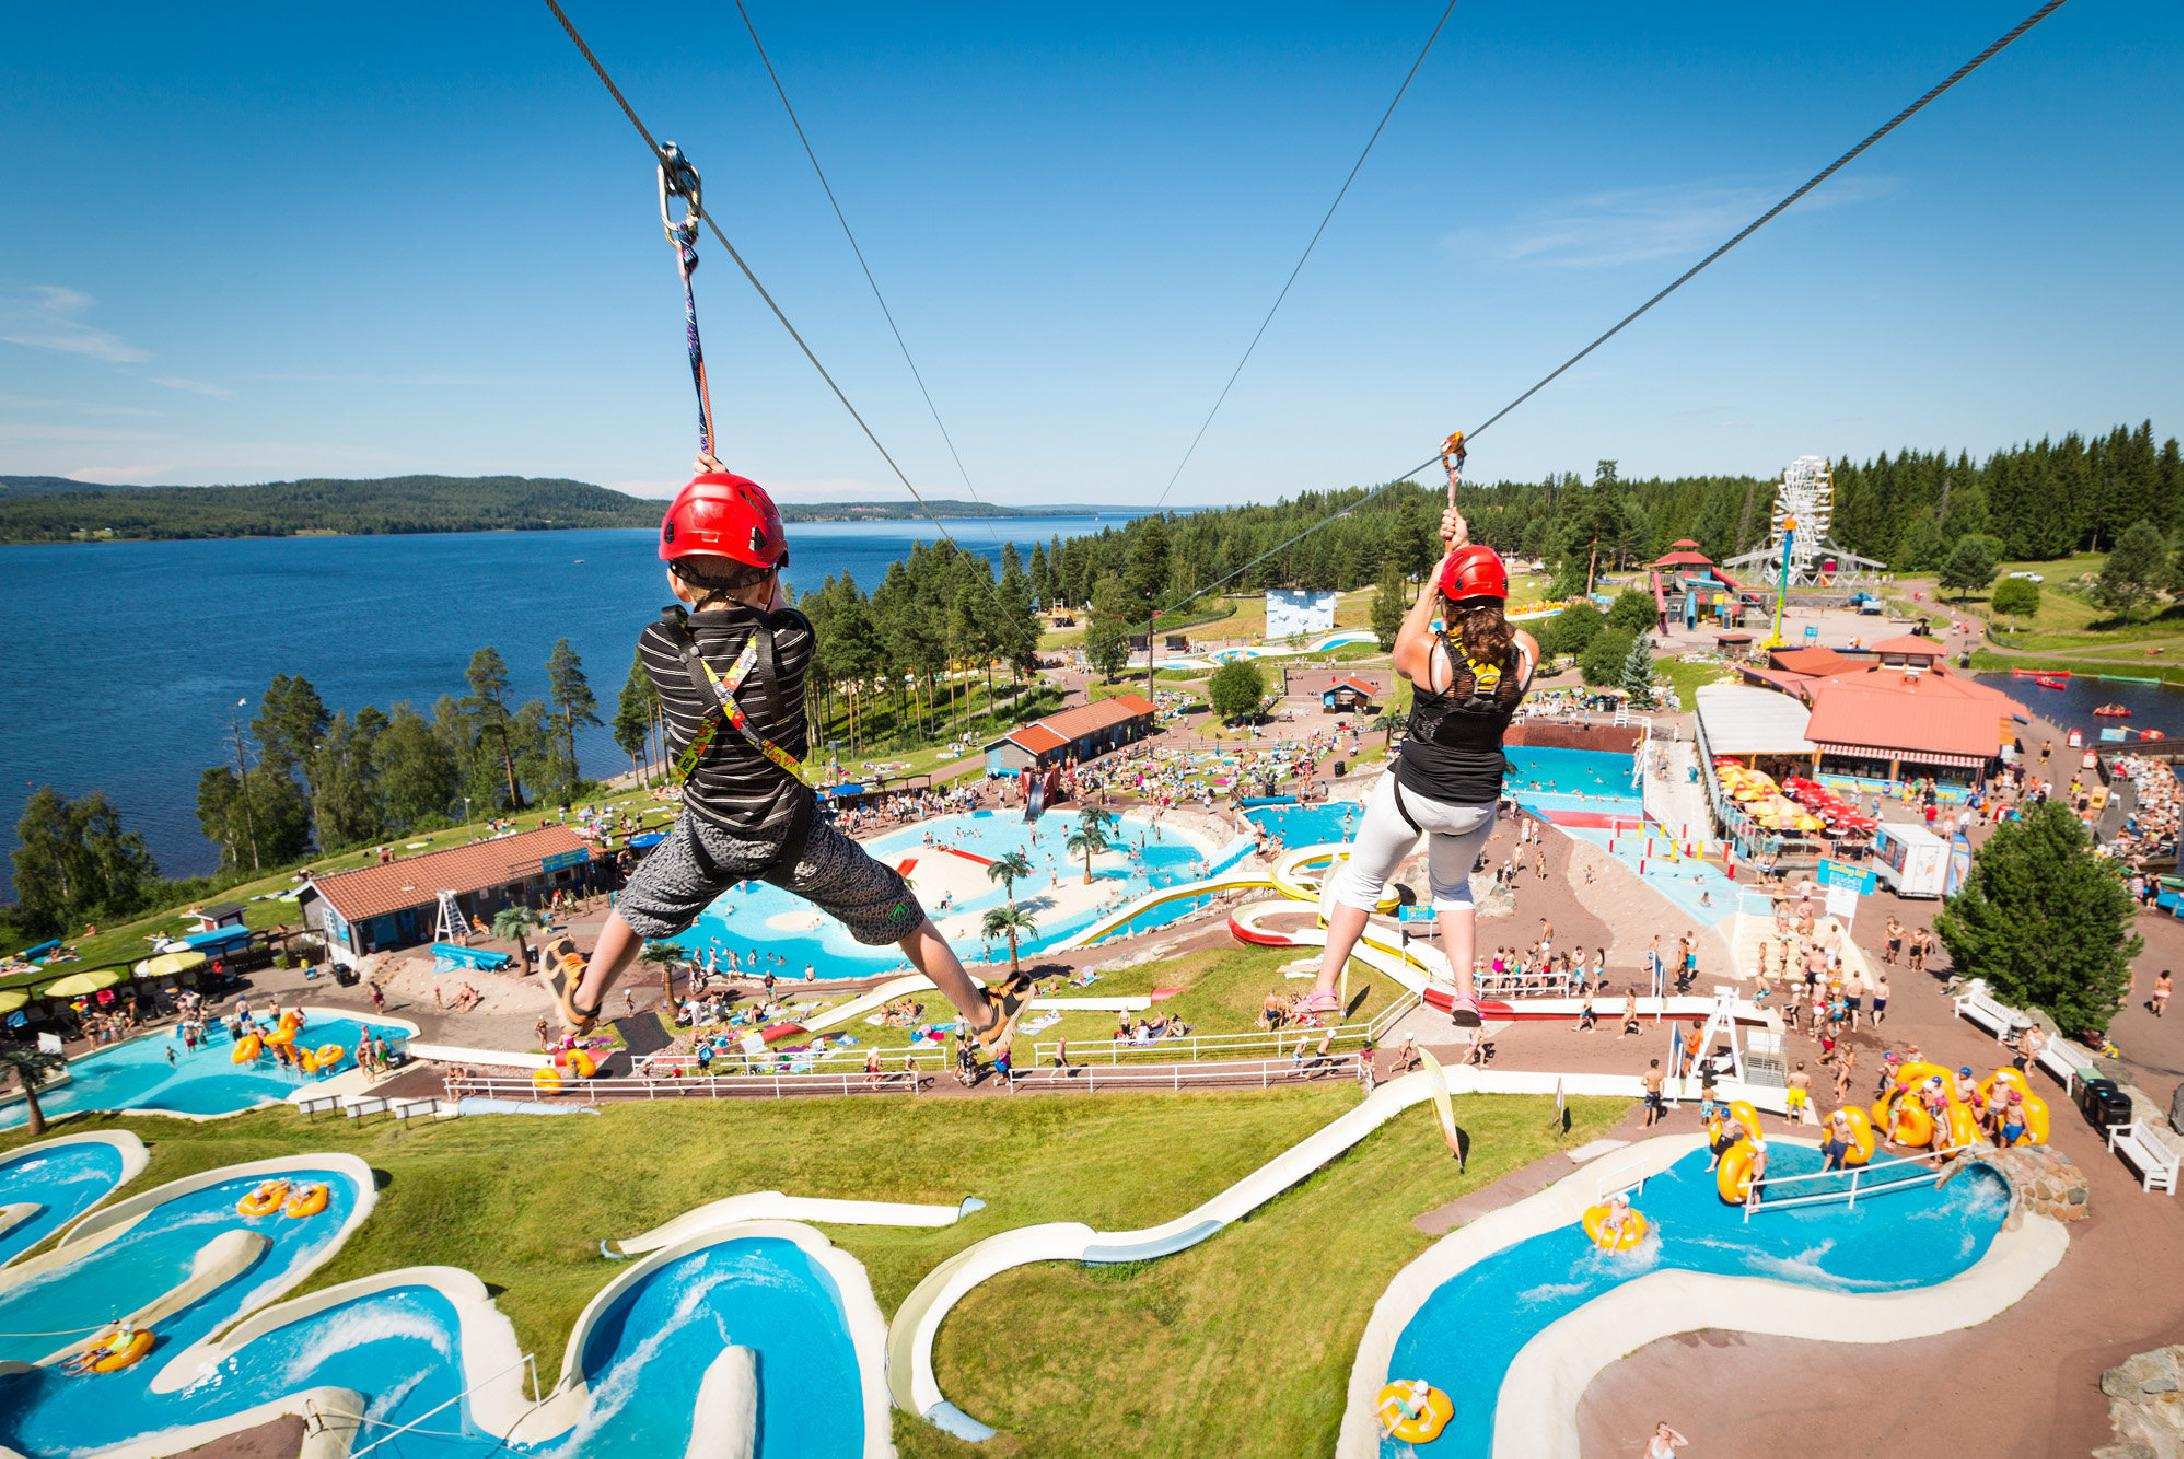 kart over camping i sverige Camping i Sverige | Visit Sweden kart over camping i sverige